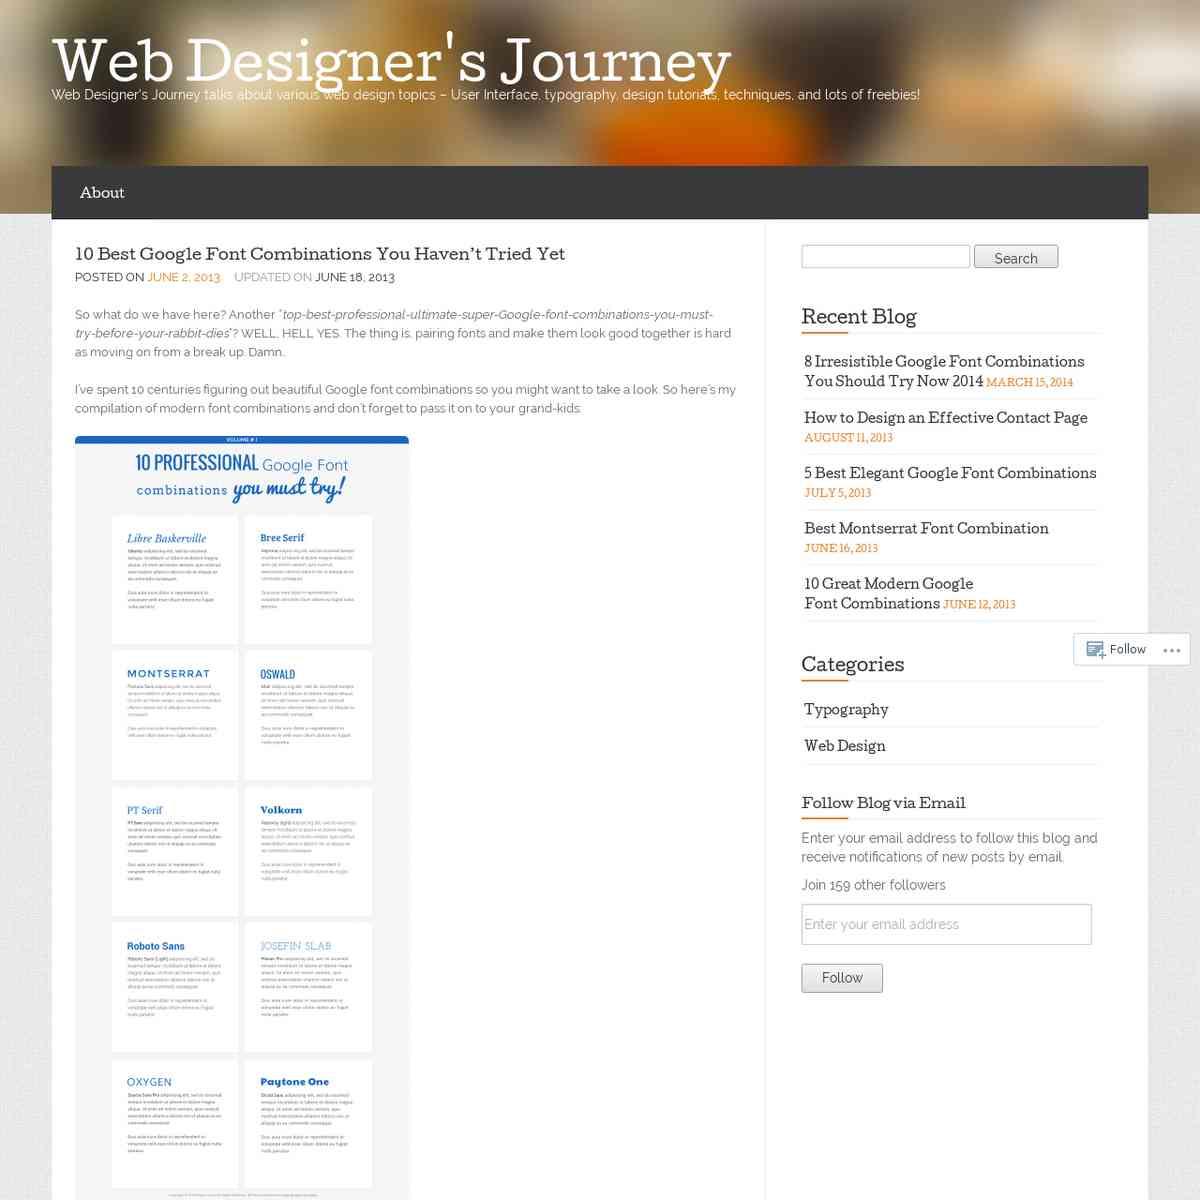 10 Best Google Font Combinations You Haven't Tried Yet « Web Designer's Journey